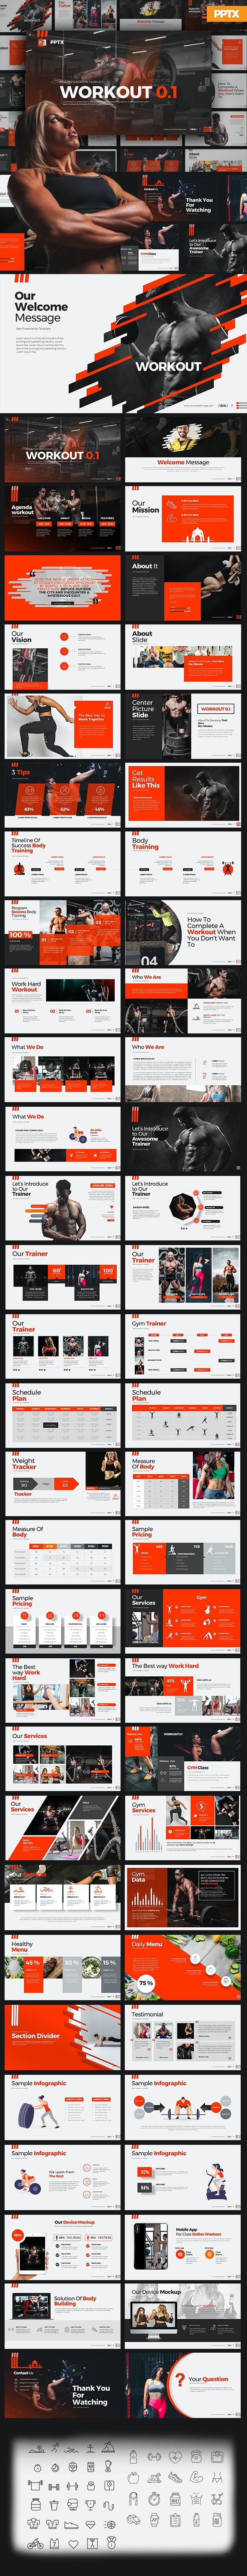 Workout 0.1 PowerPoint Presentation - Creative PowerPoint Templates